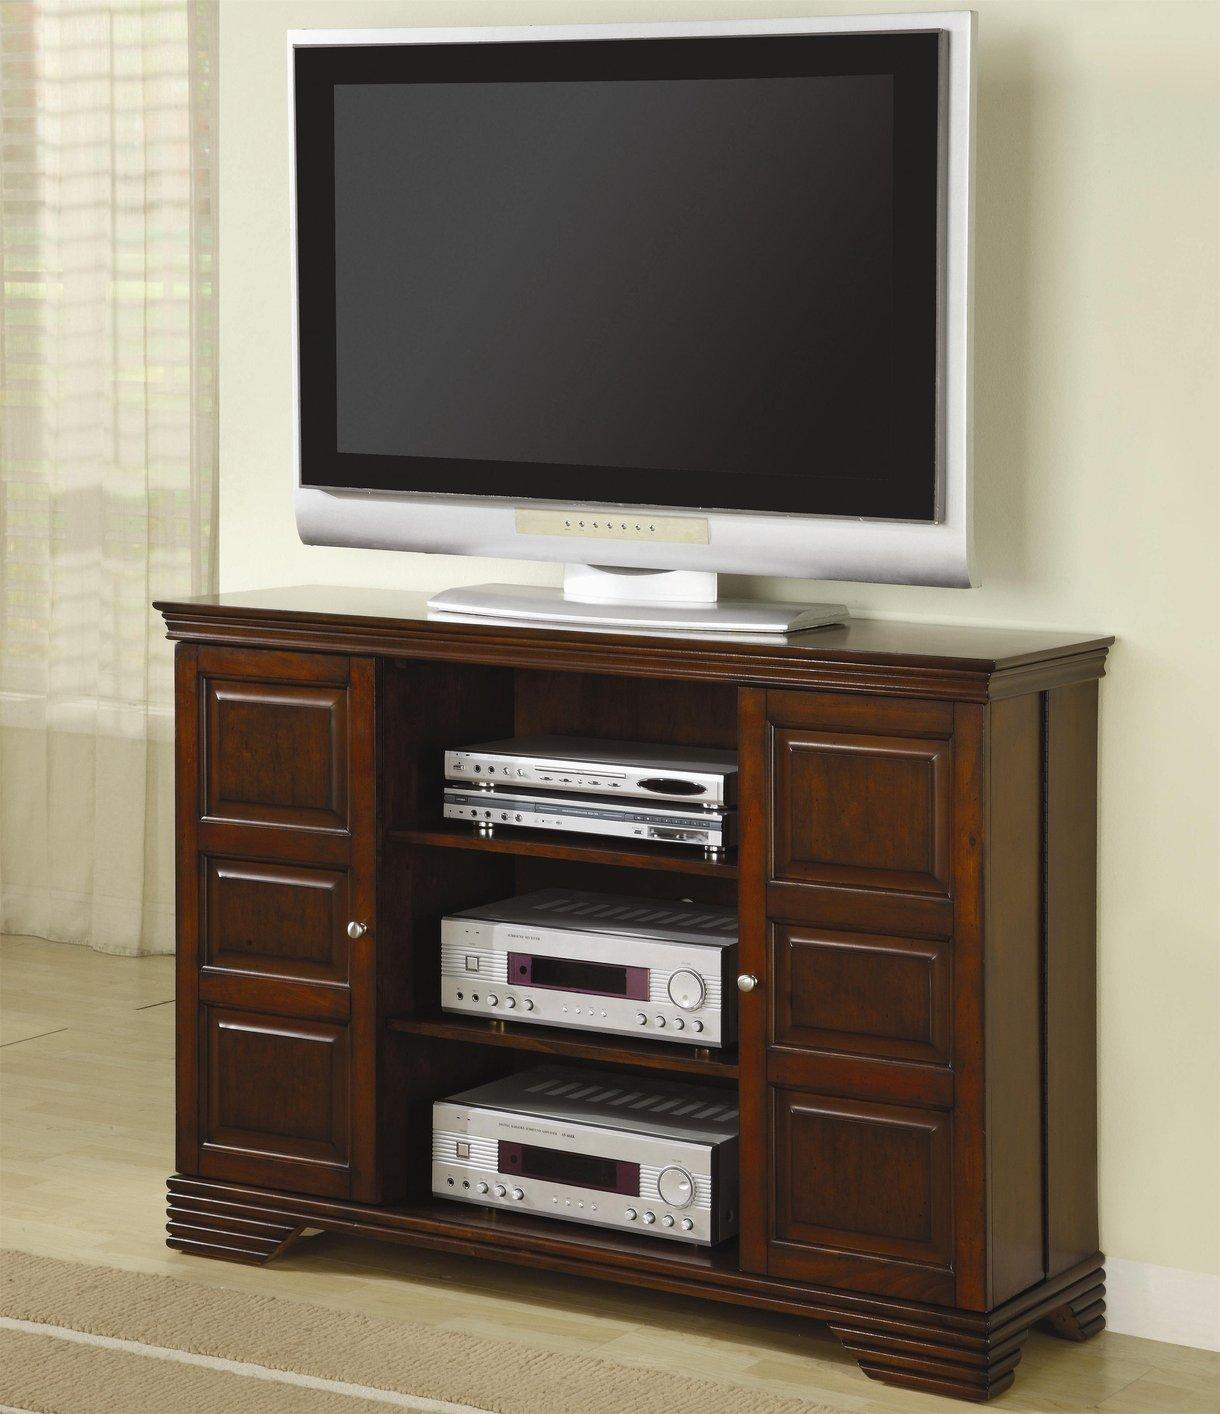 Walmart Wood Tv Stand | Woodtv | Wood Tv8 News Grand Rapids